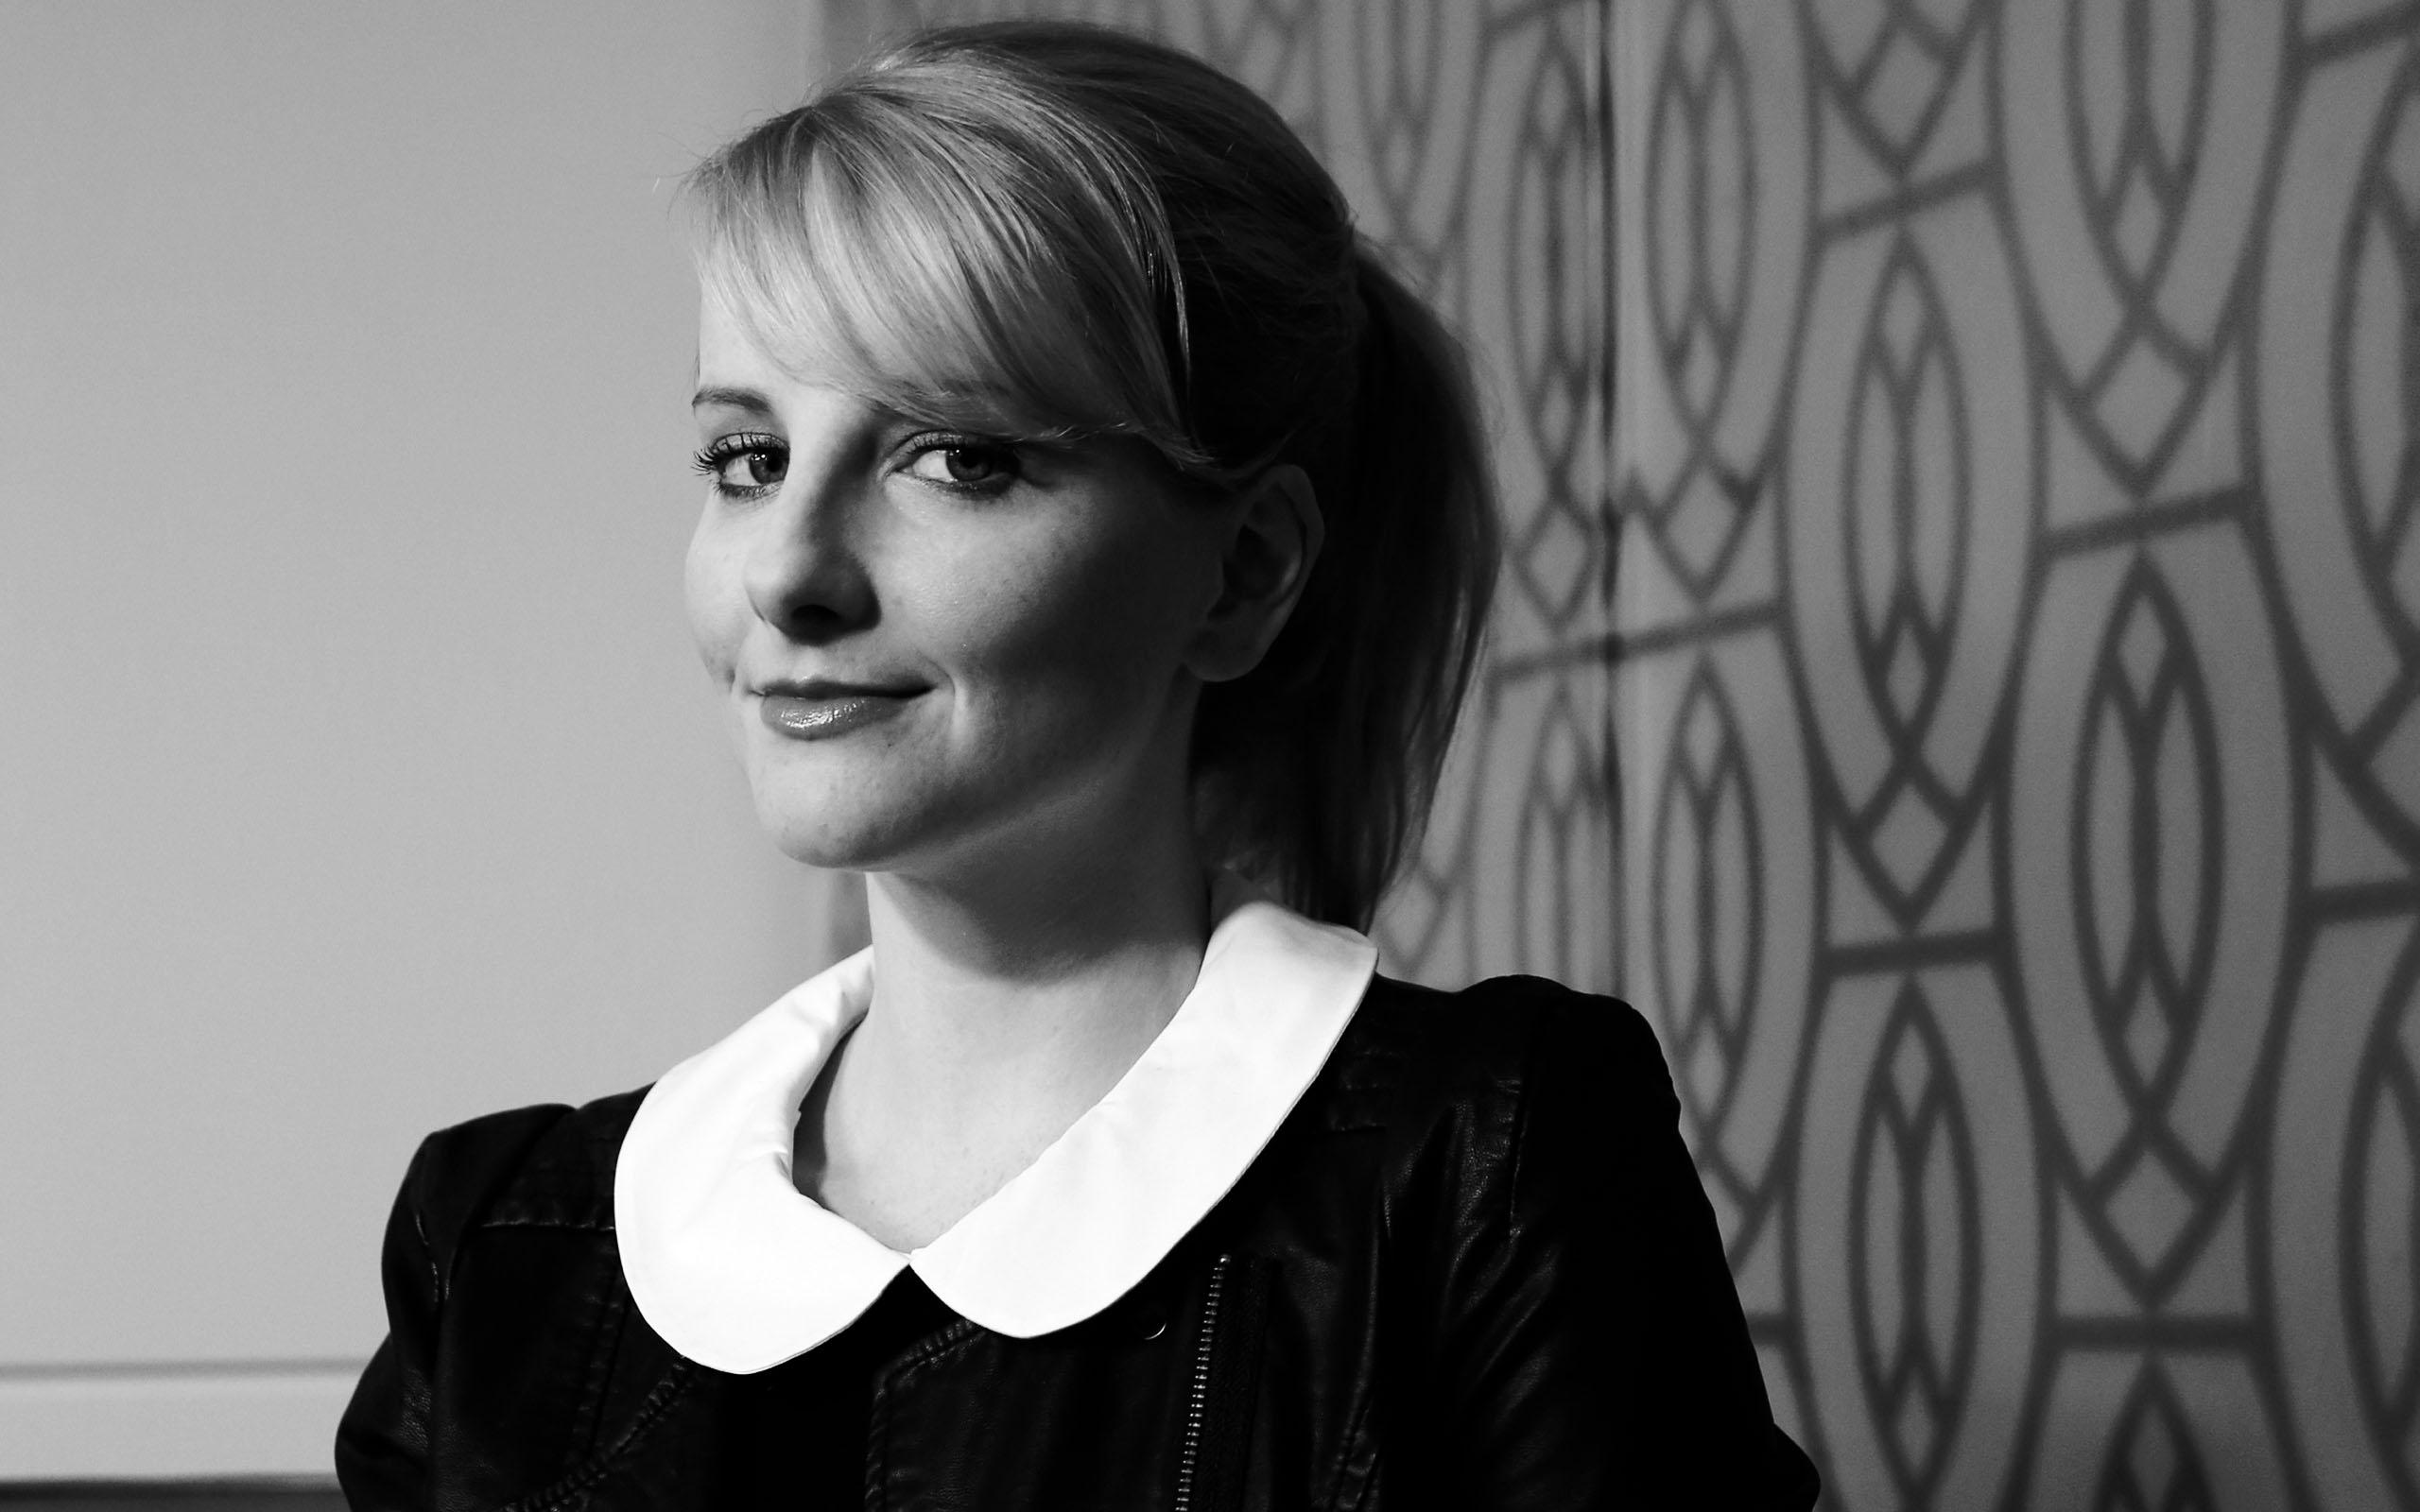 Wallpaper Melissa Rauch Blonde Monochrome Actress 2560x1600